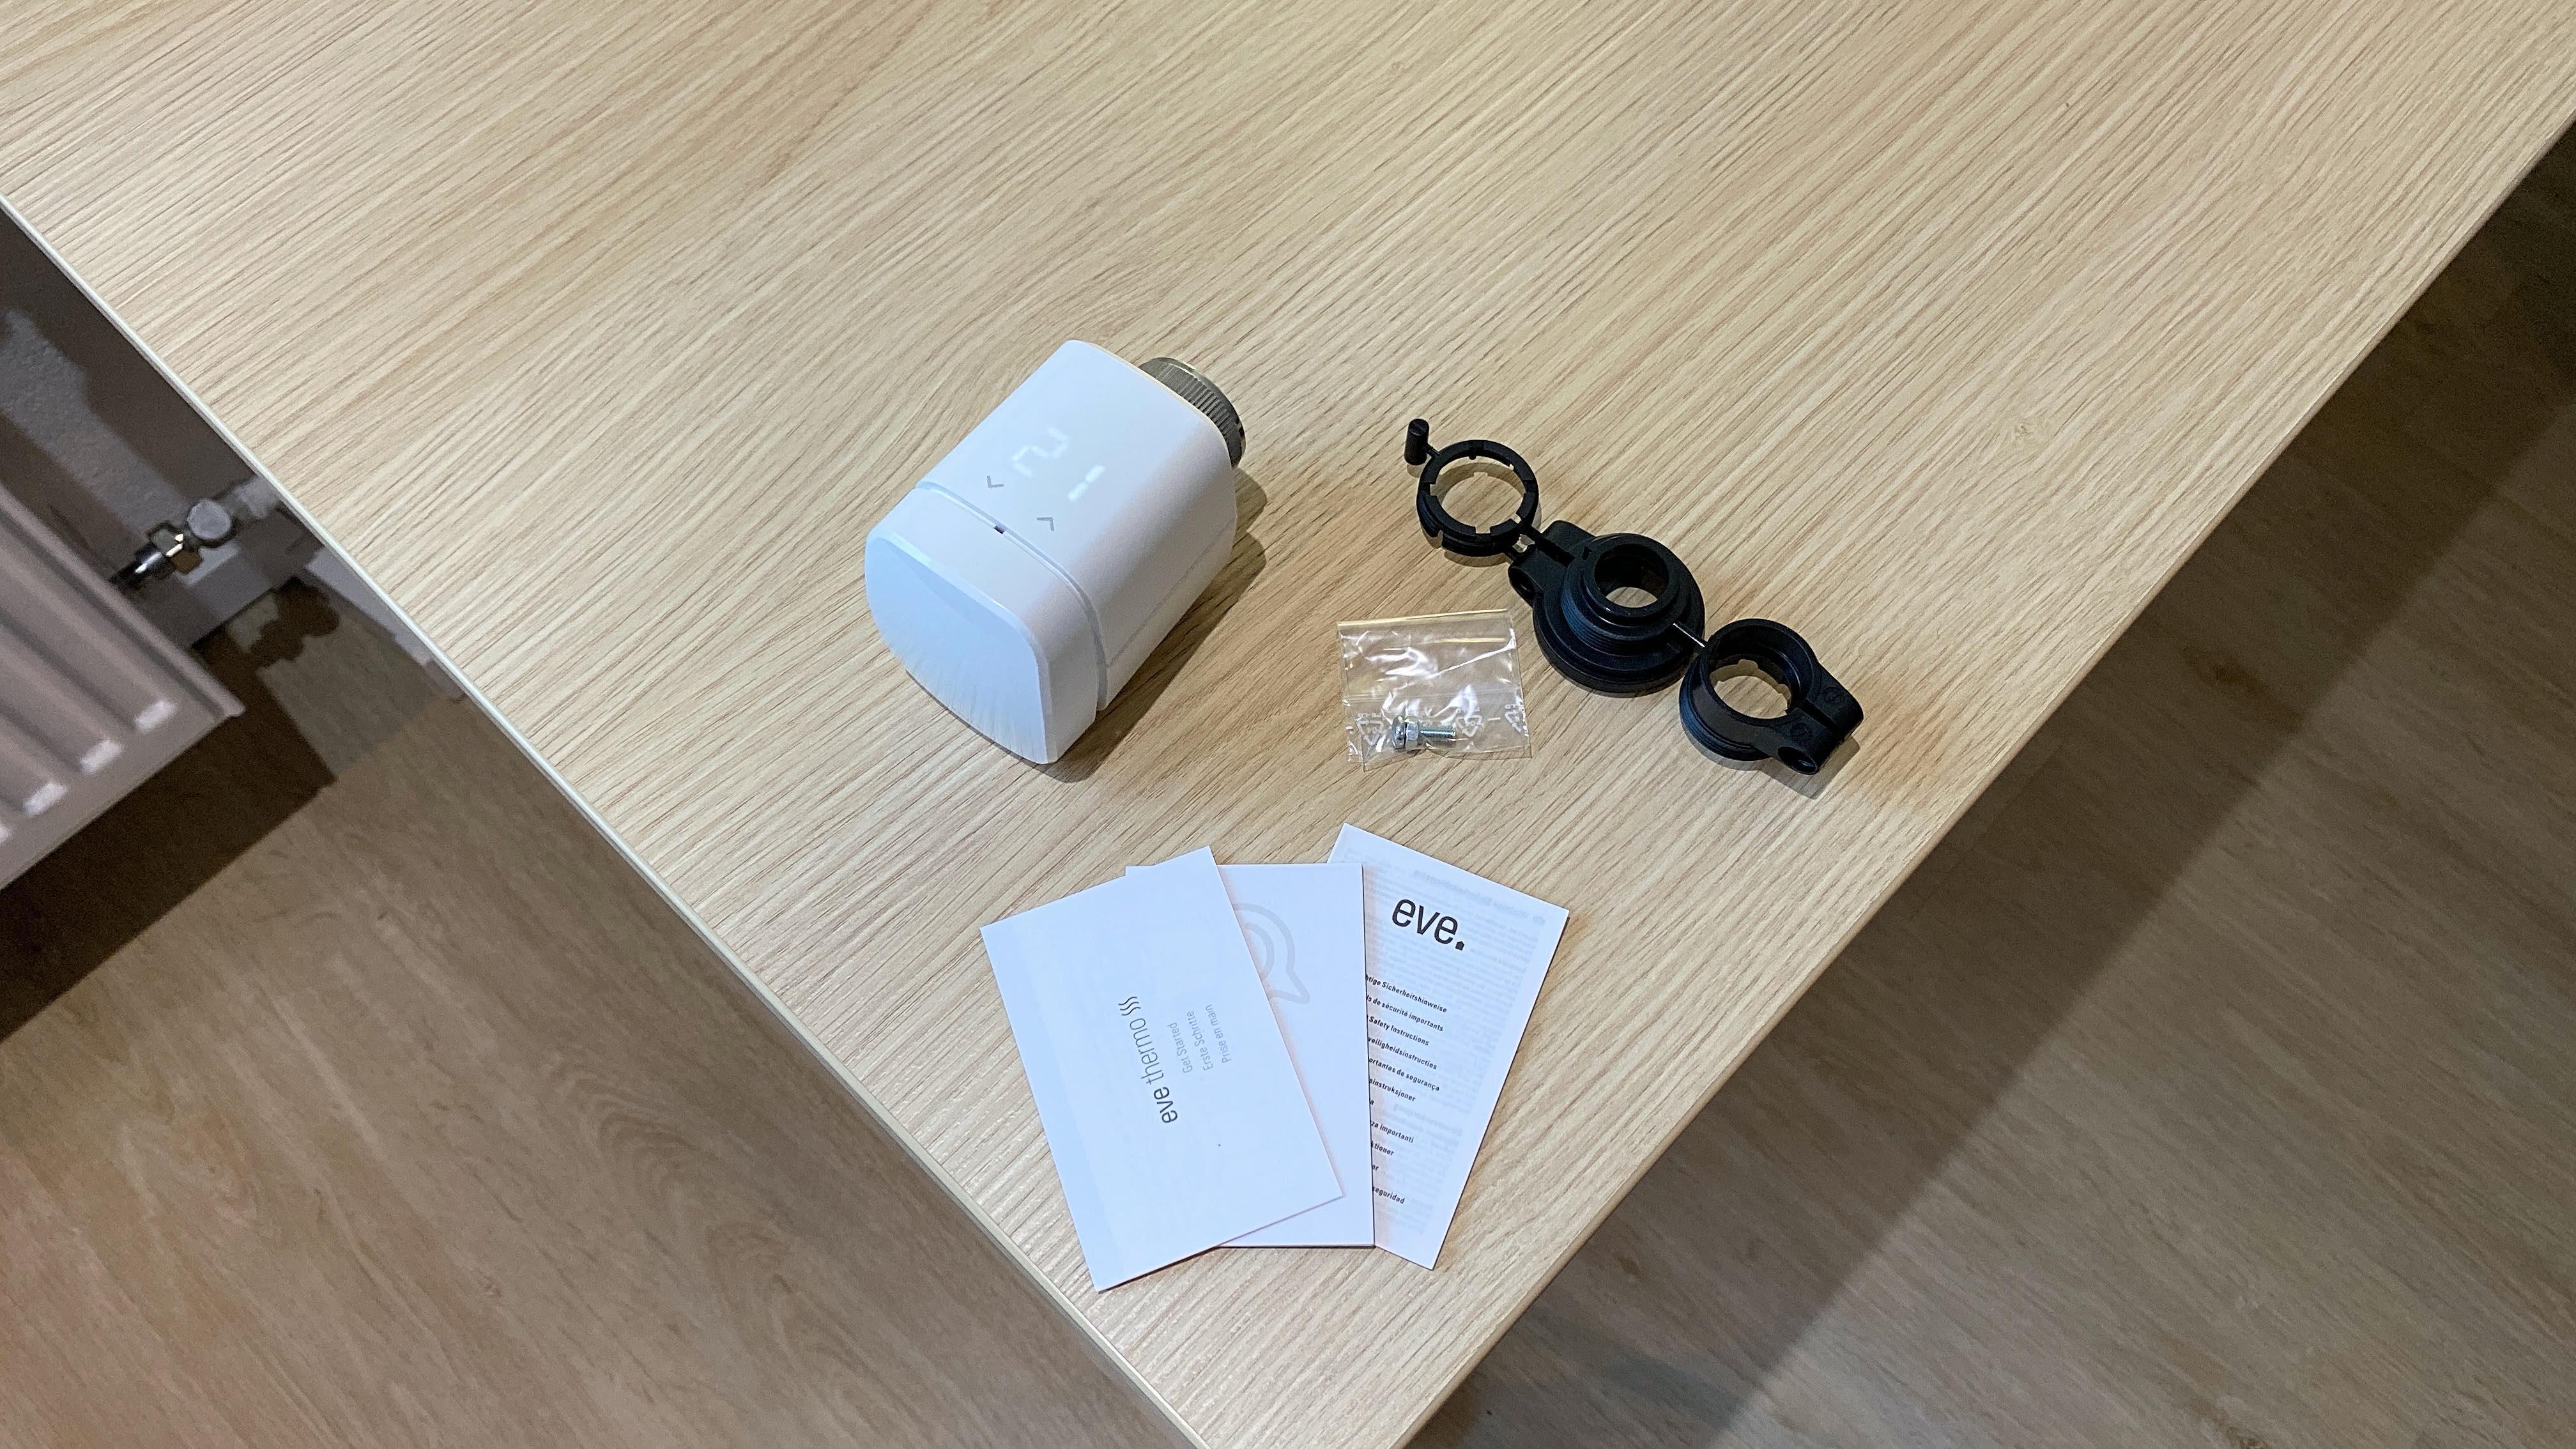 Eve_Thermo_Gen_3_HomeKit_Apple_SmartHome3 Der Eve Thermo Gen. 3 von Eve - warmes Raumklima via Apple HomeKit